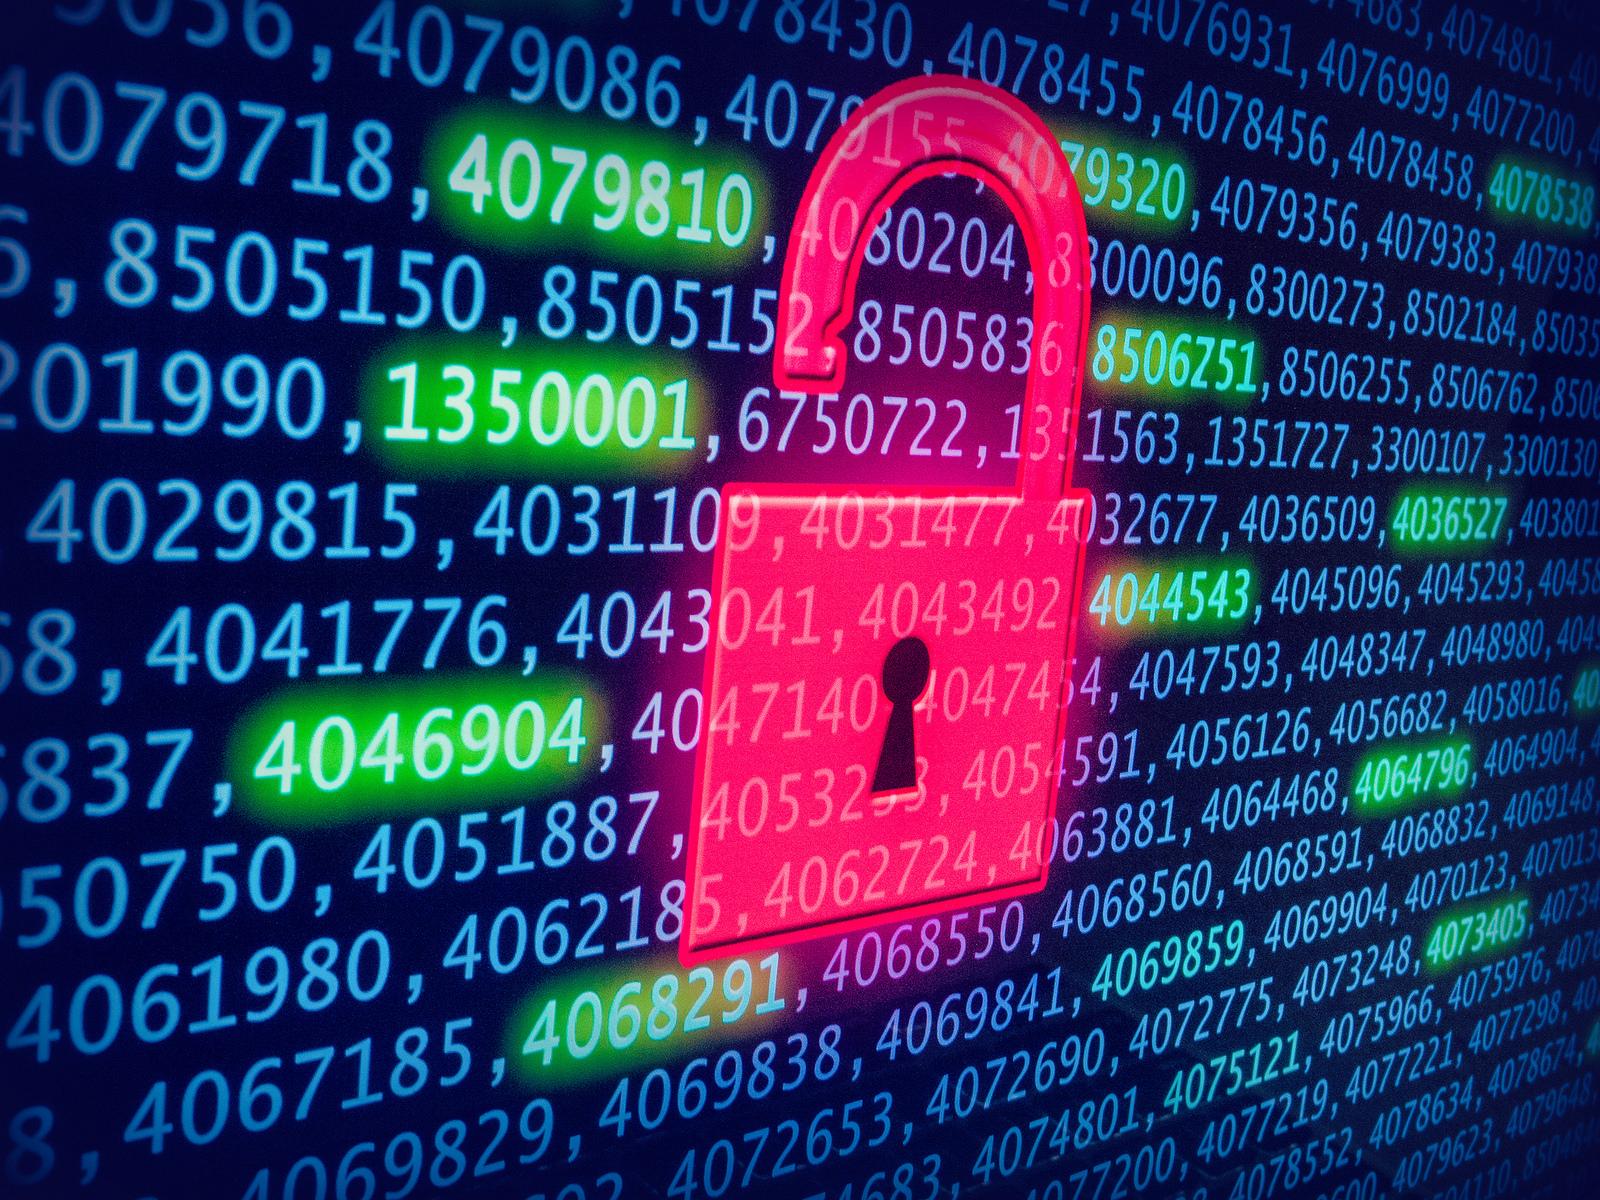 Cyber crime, Foter